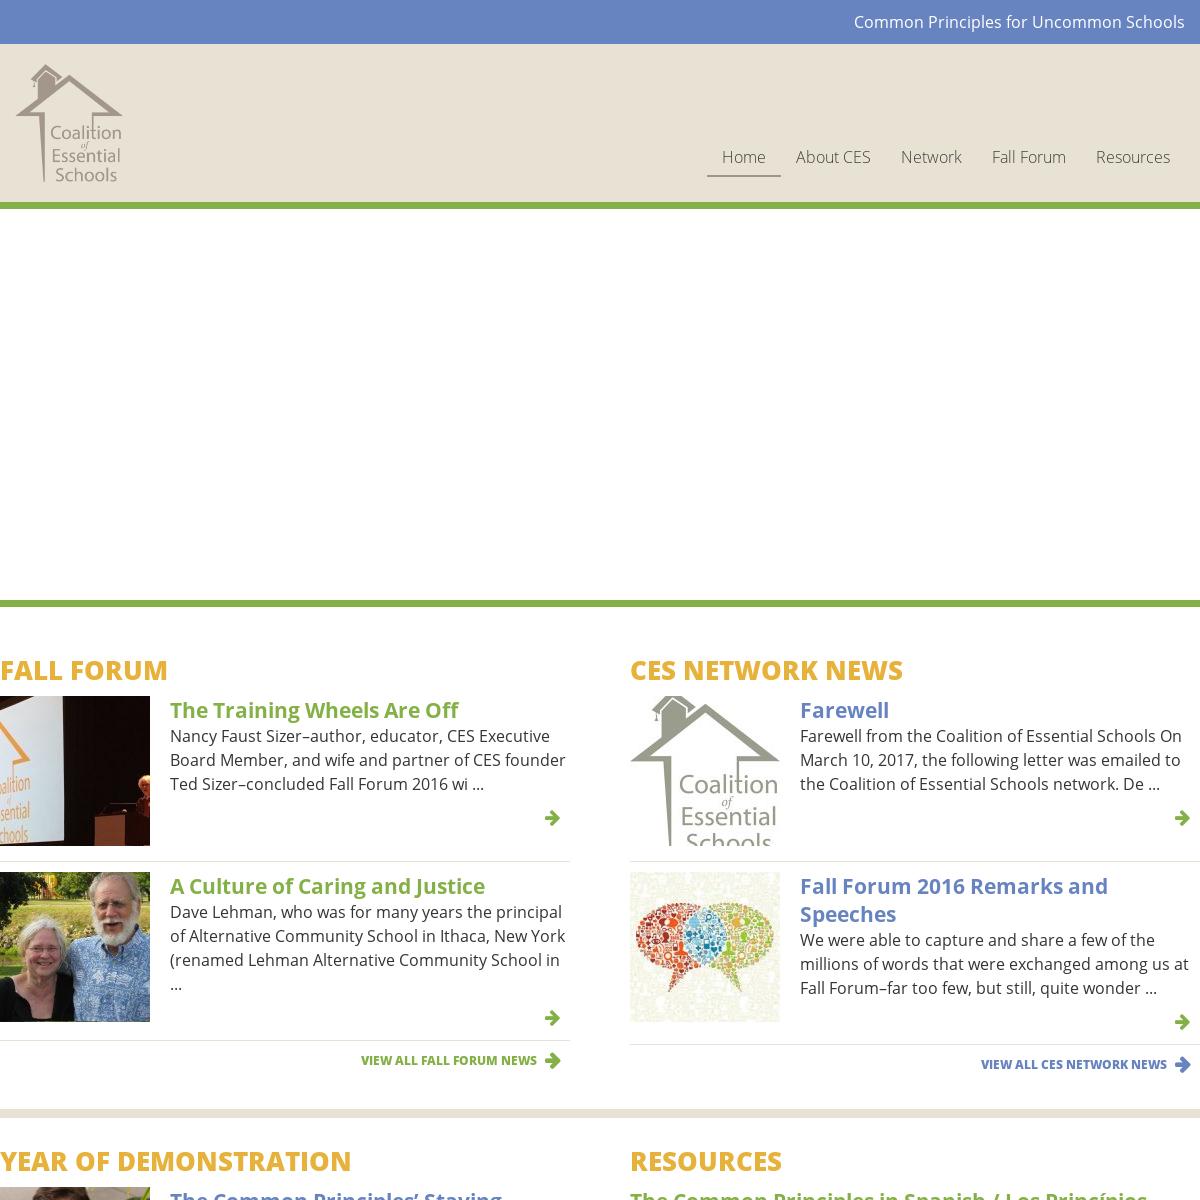 Coalition of Essential Schools - Coalition of Essential Schools